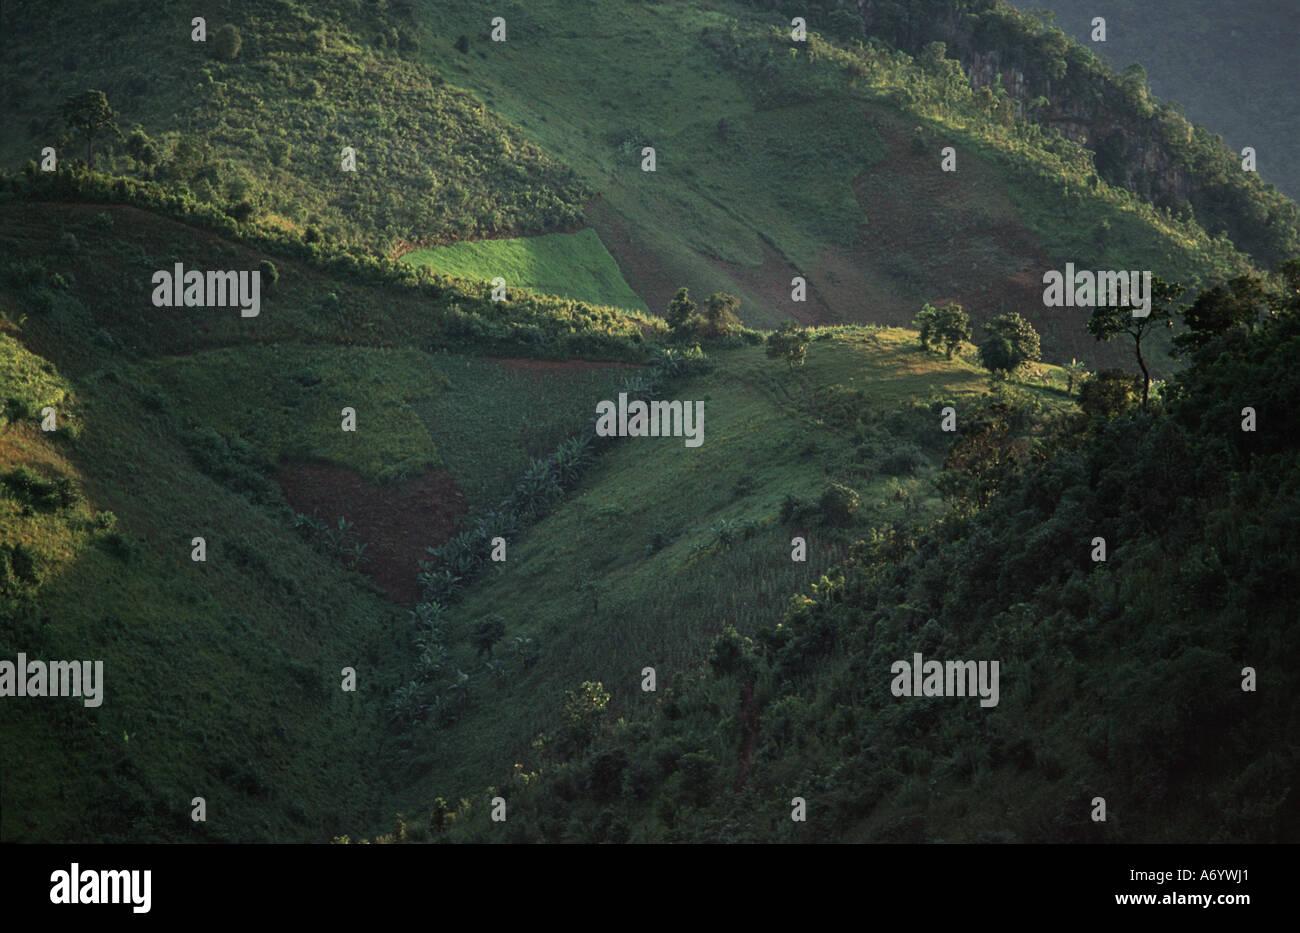 Hilltribe vista Trekking out of Kalaw en route towards Shwe Min Bone village Shan State Burma - Stock Image